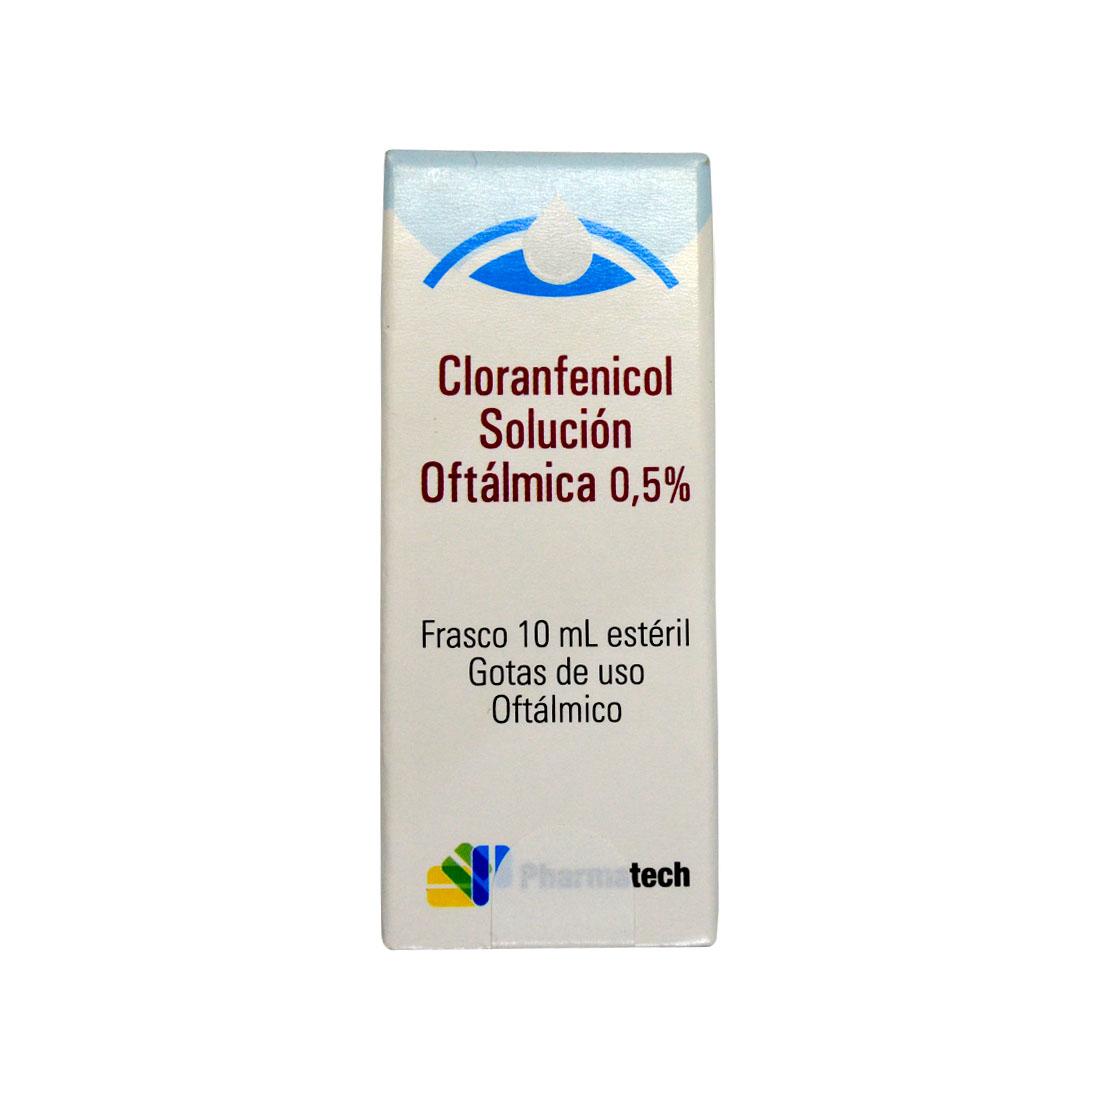 cloranfenicol 0,5% x 10 ml solucion oftalmica